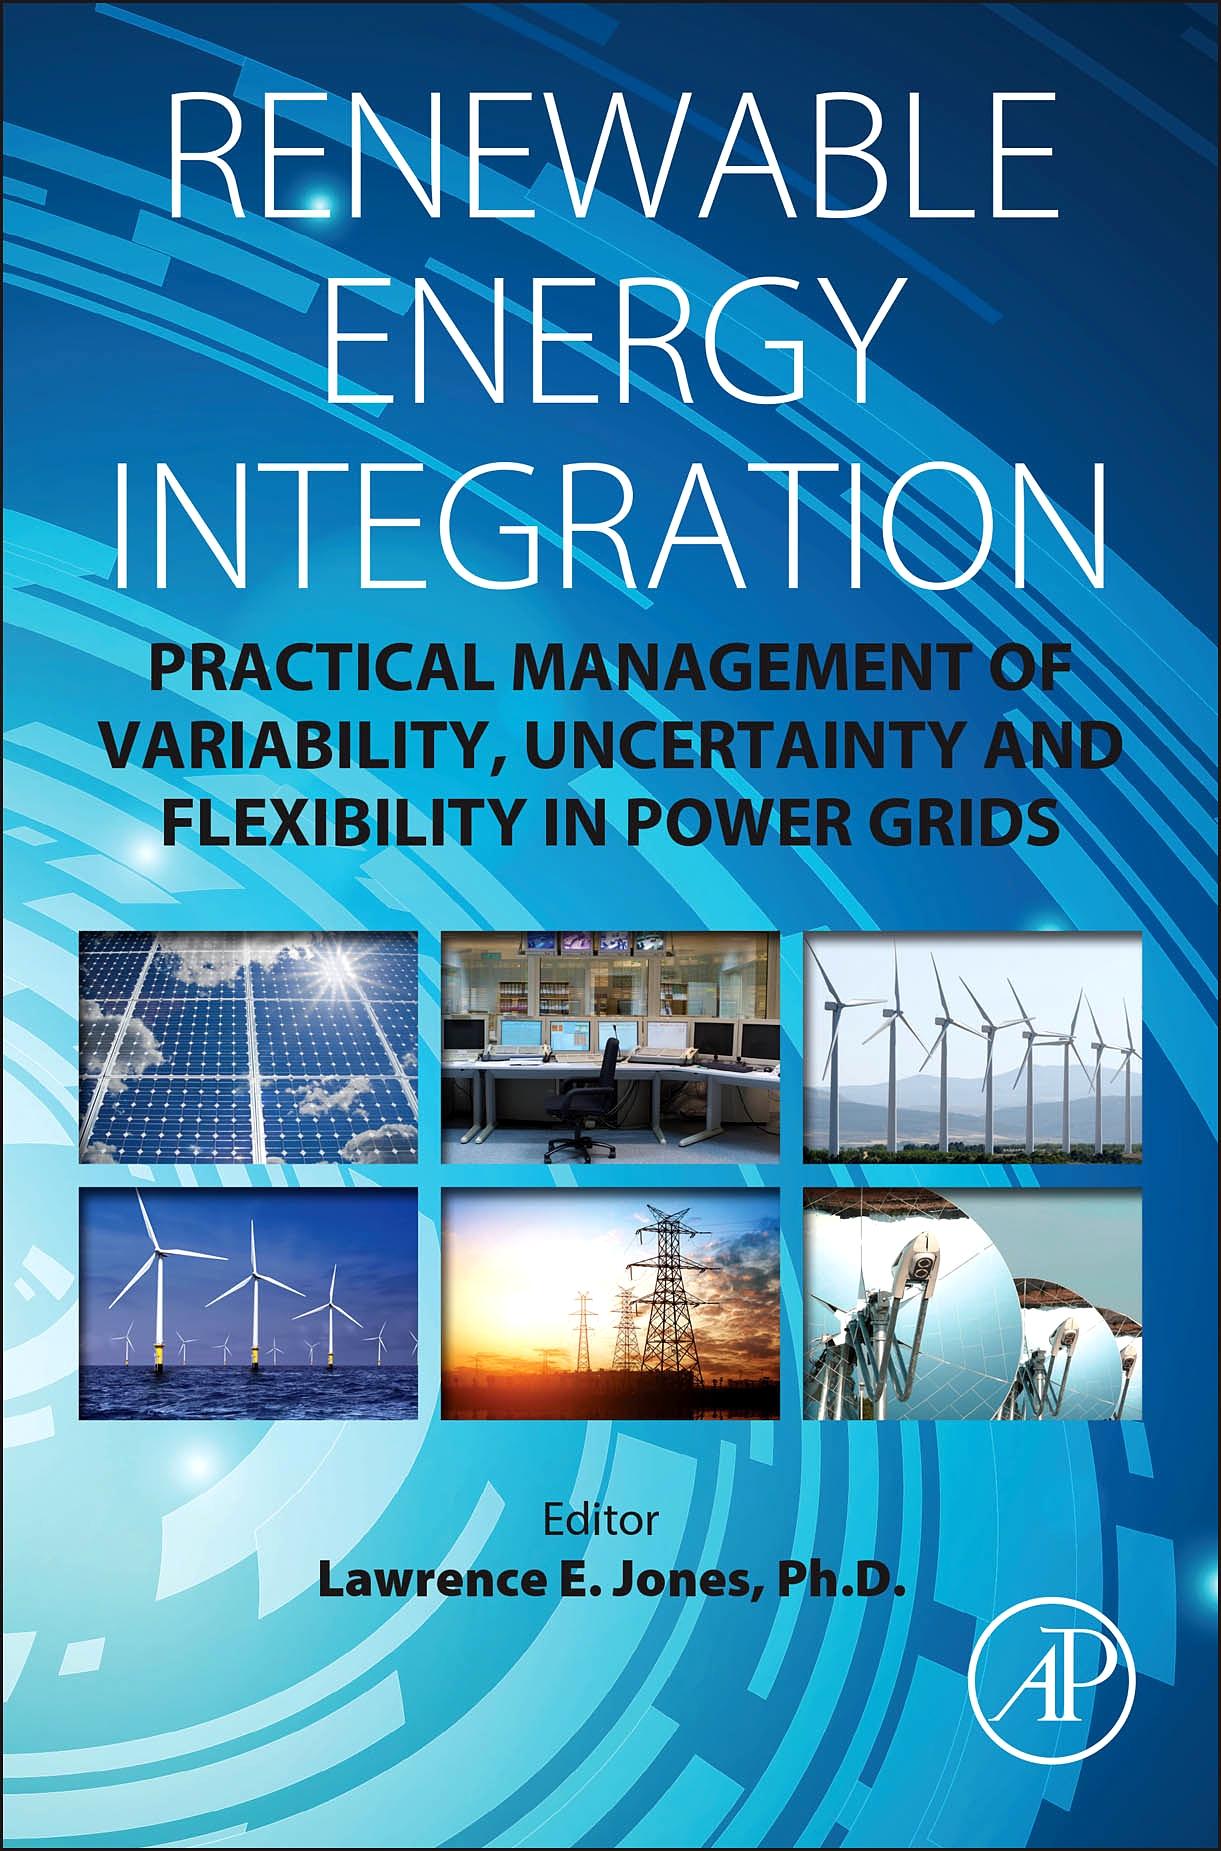 Elsevier Publishes Seven New Books On Renewable Energy